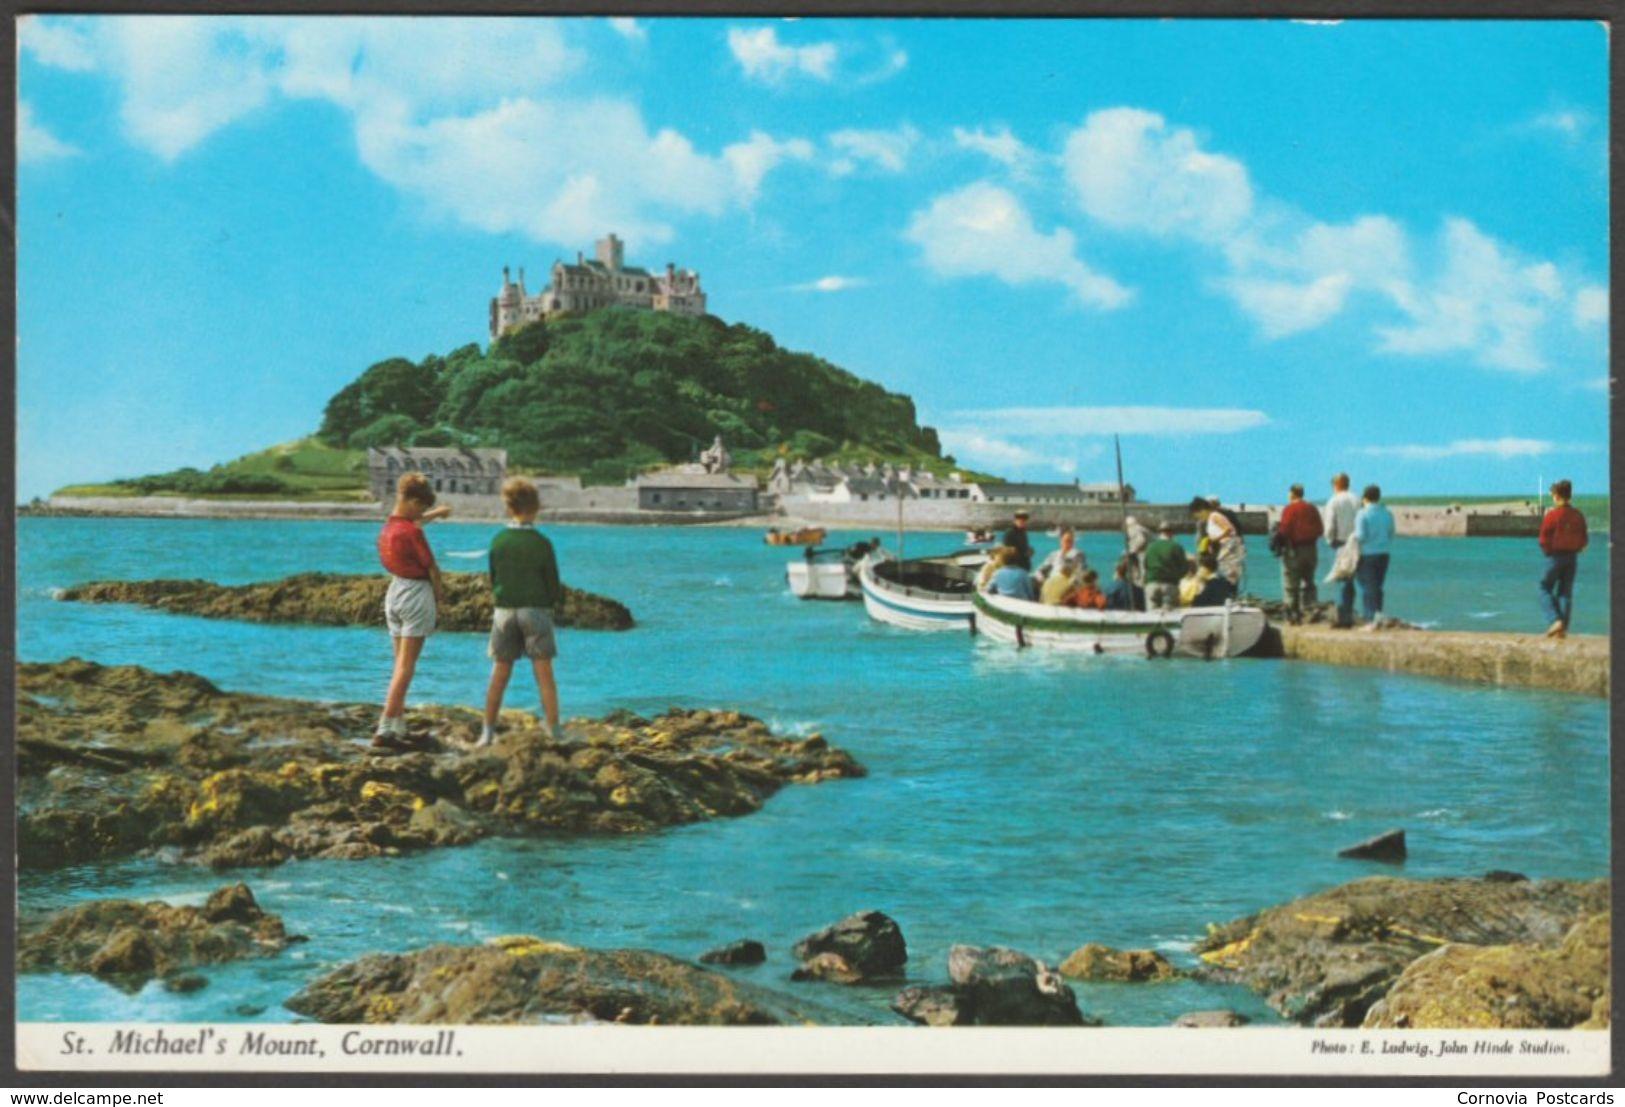 St Michael's Mount, Cornwall, C.1980 - John Hinde Postcard - St Michael's Mount